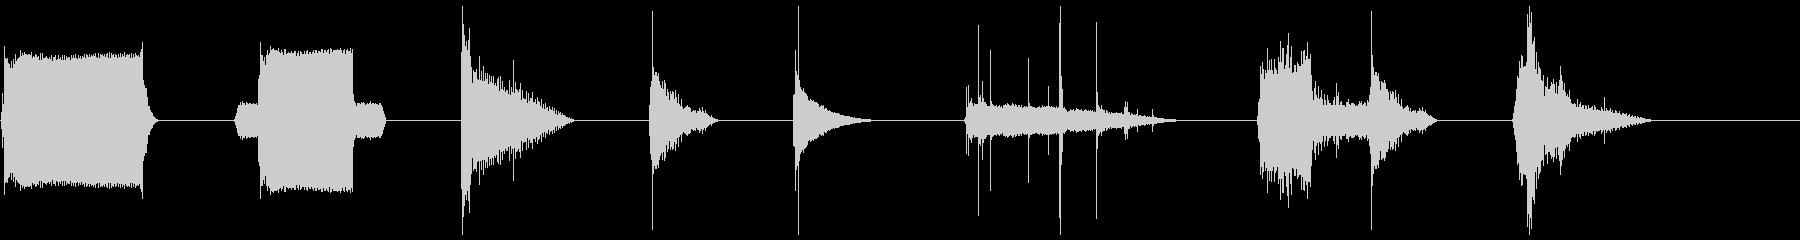 X8をオンにしたネオンライトストリップの未再生の波形